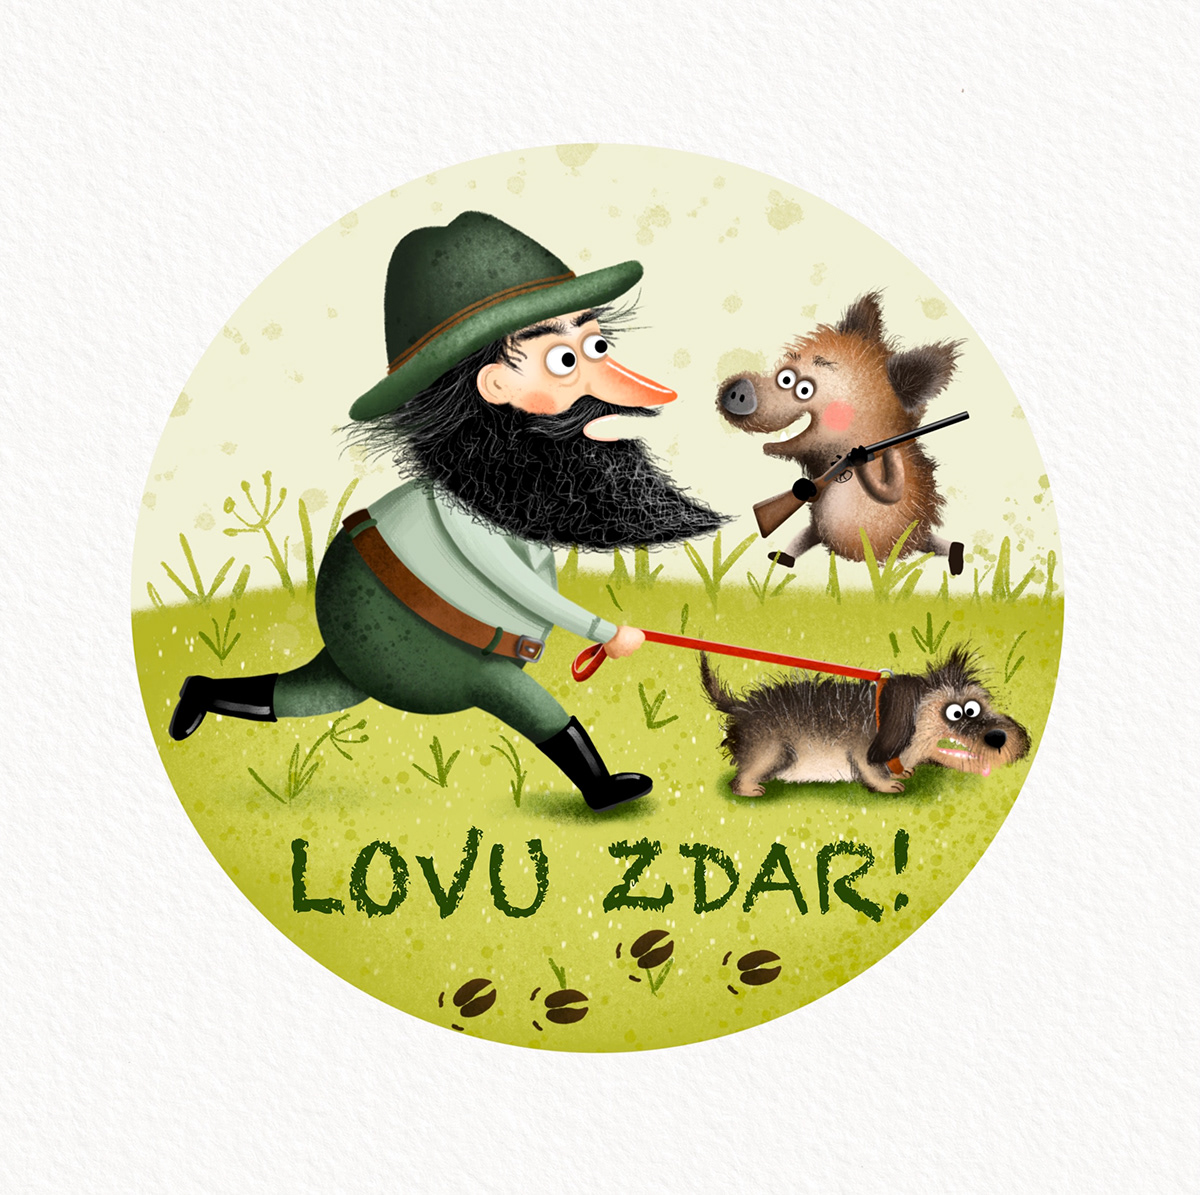 animals cartoon Character dachshund dog forest hunter ILLUSTRATION  Nature Wildboar